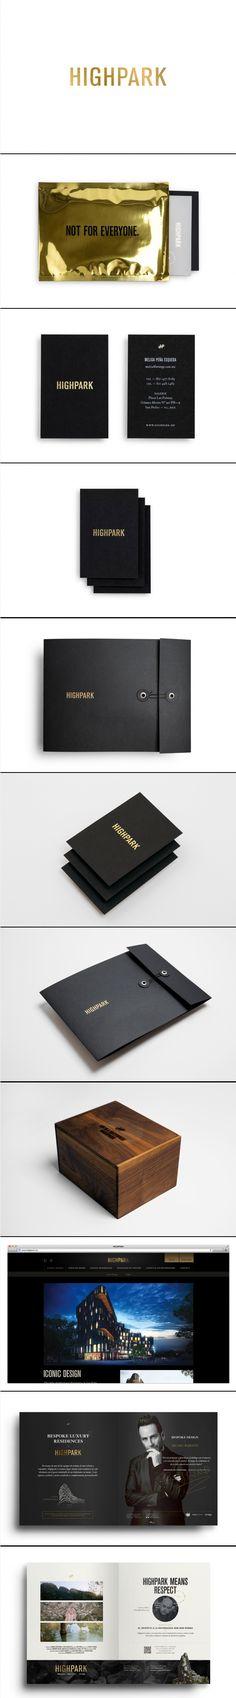 Supermodernist design studio specialised in developing honest branding projects across the world. Letterhead Design, Corporate Design, Graphic Design Typography, Business Design, Identity Design, Visual Identity, Identity Branding, Brand New Day, Stationary Design